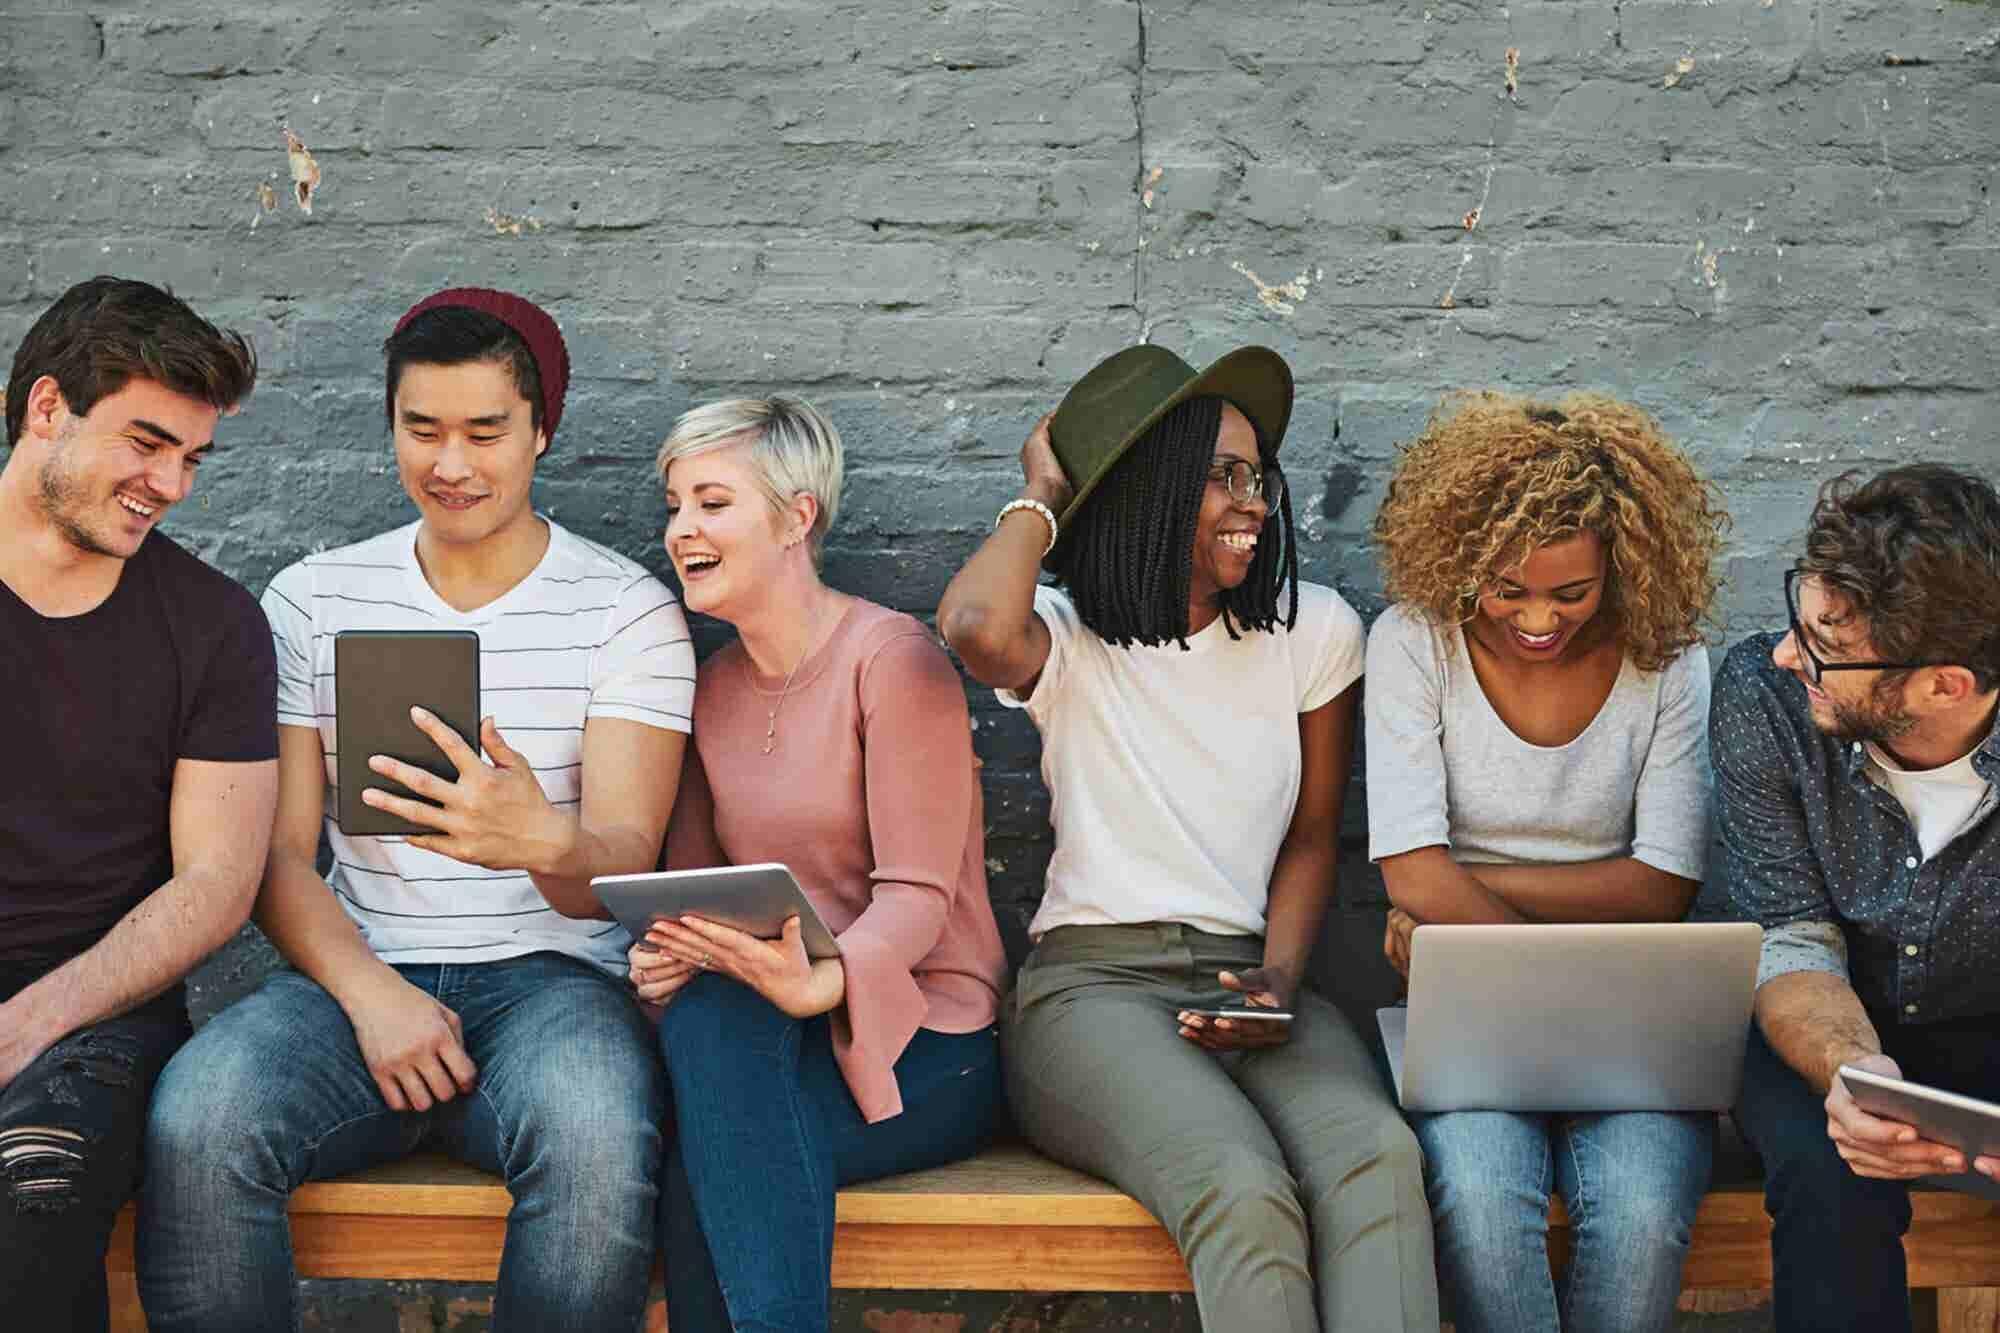 4 Strategies to Use When Marketing to Millennials